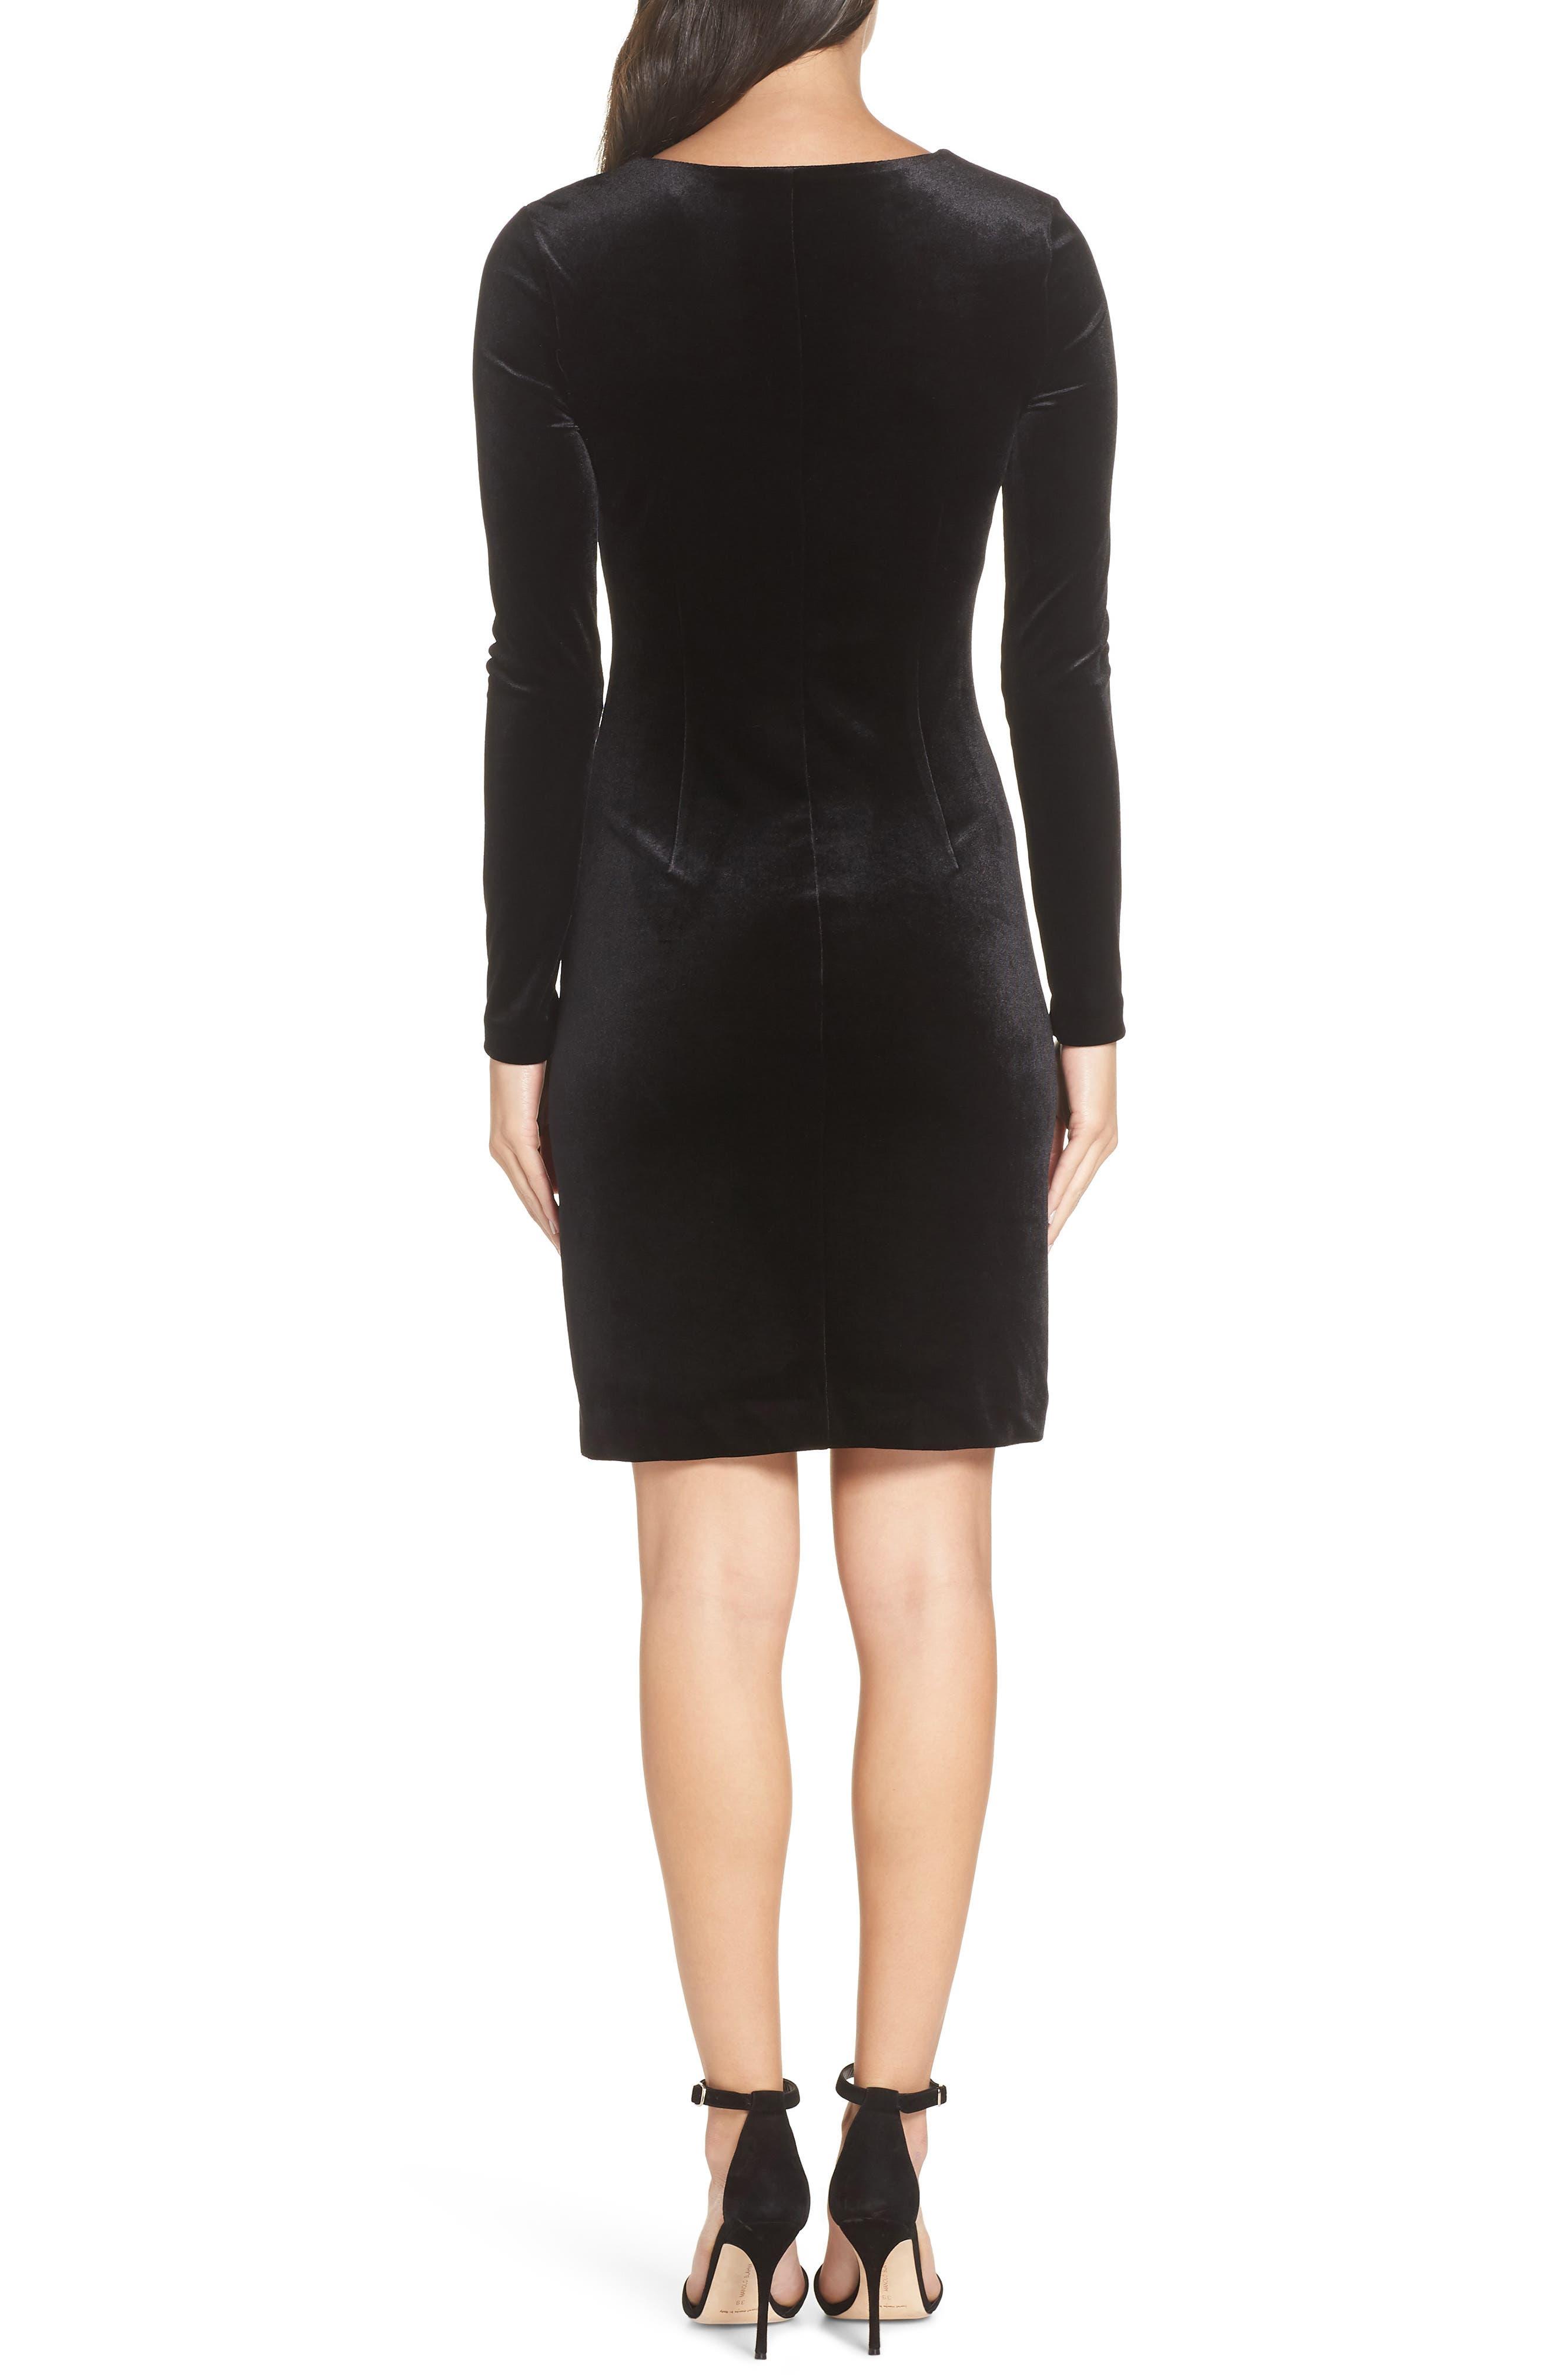 Zella Aurore Velvet Jersey Sheath Dress,                             Alternate thumbnail 2, color,                             BLACK GOLD